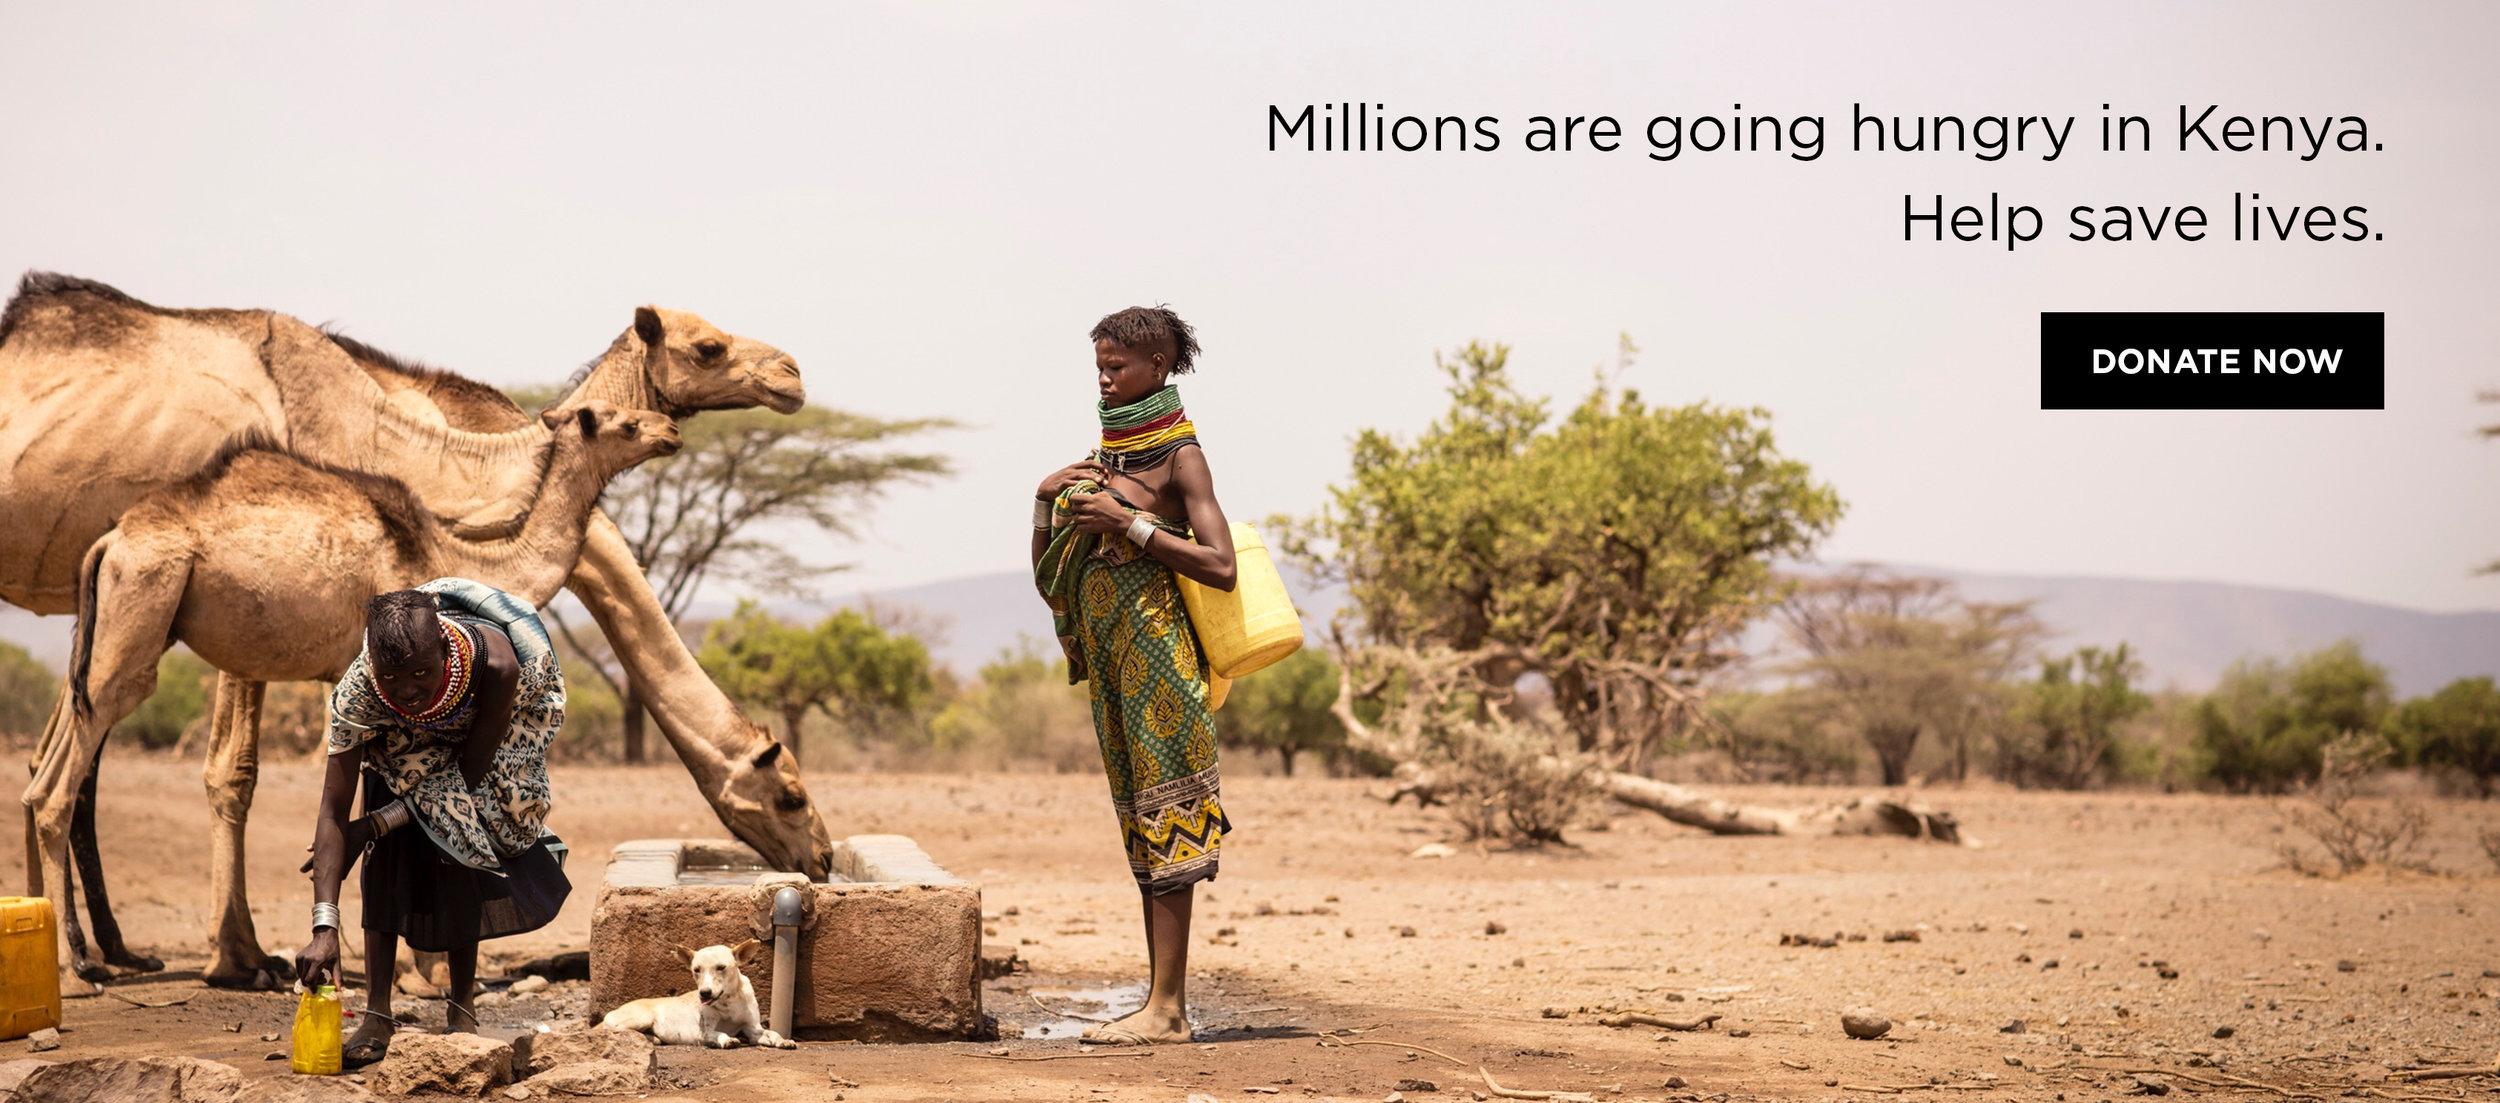 Turkana Kenya Food Crisis Relief Response